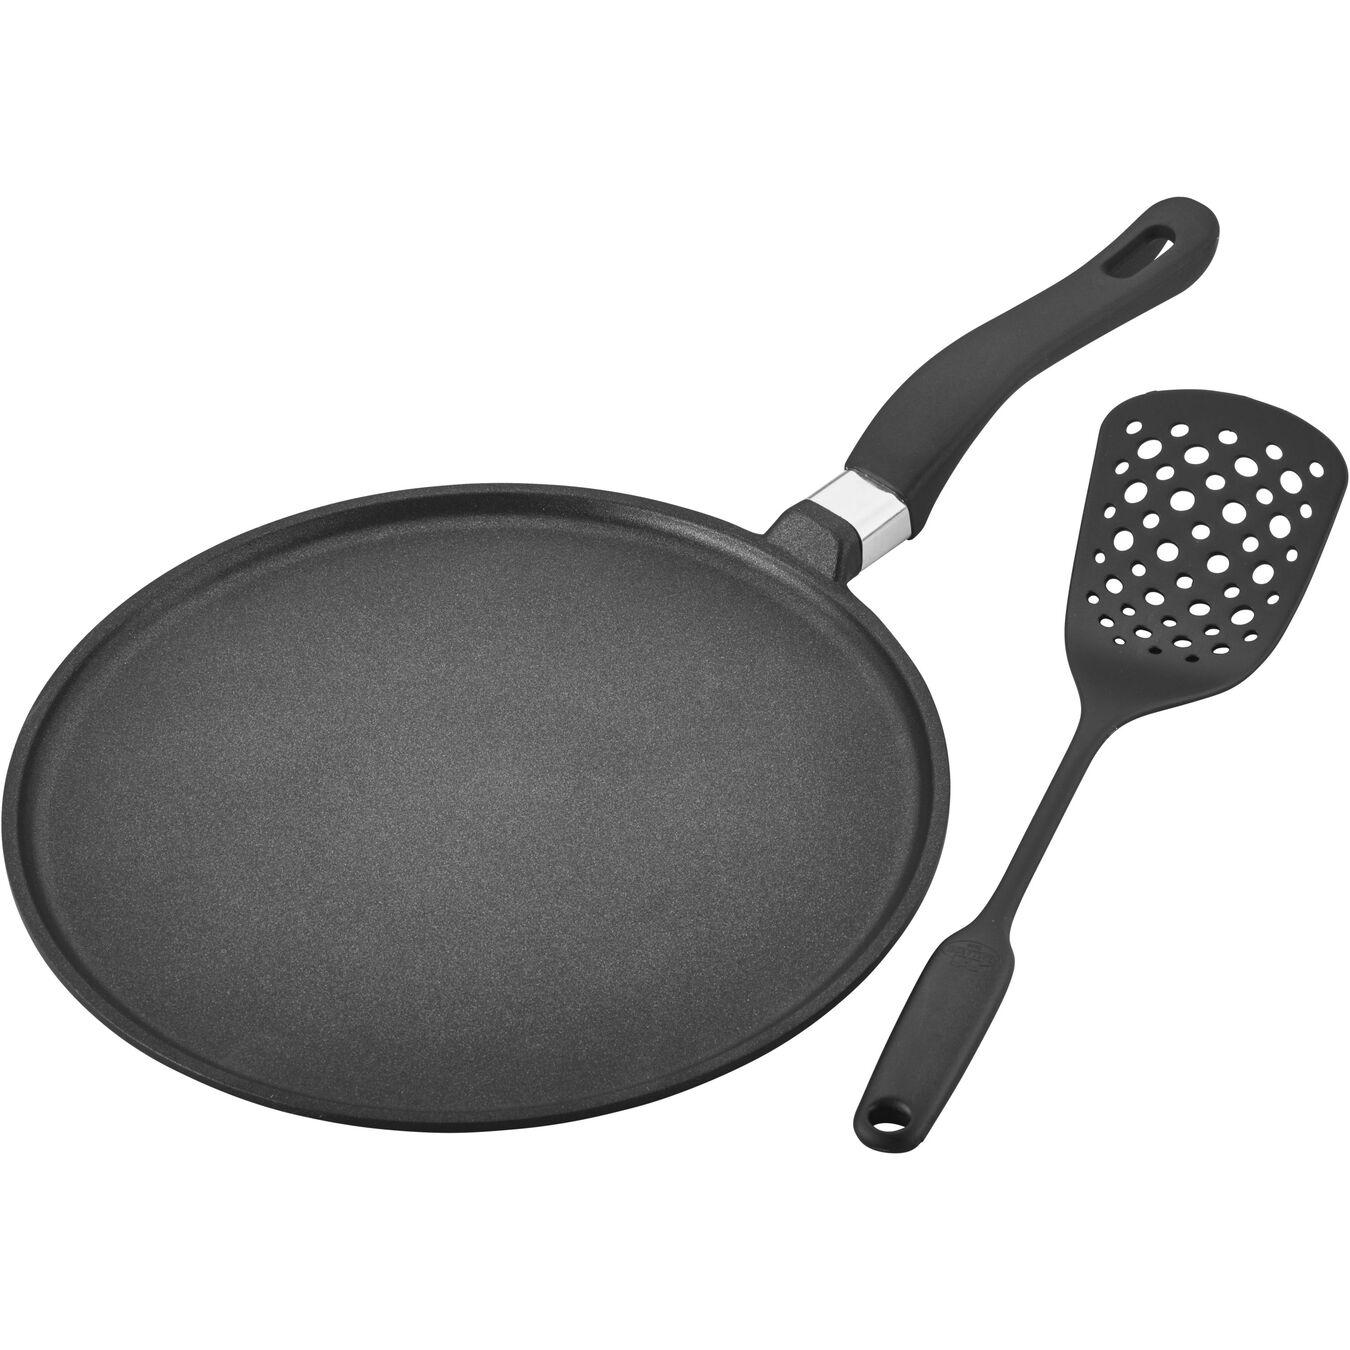 Griddle Pan set,,large 1